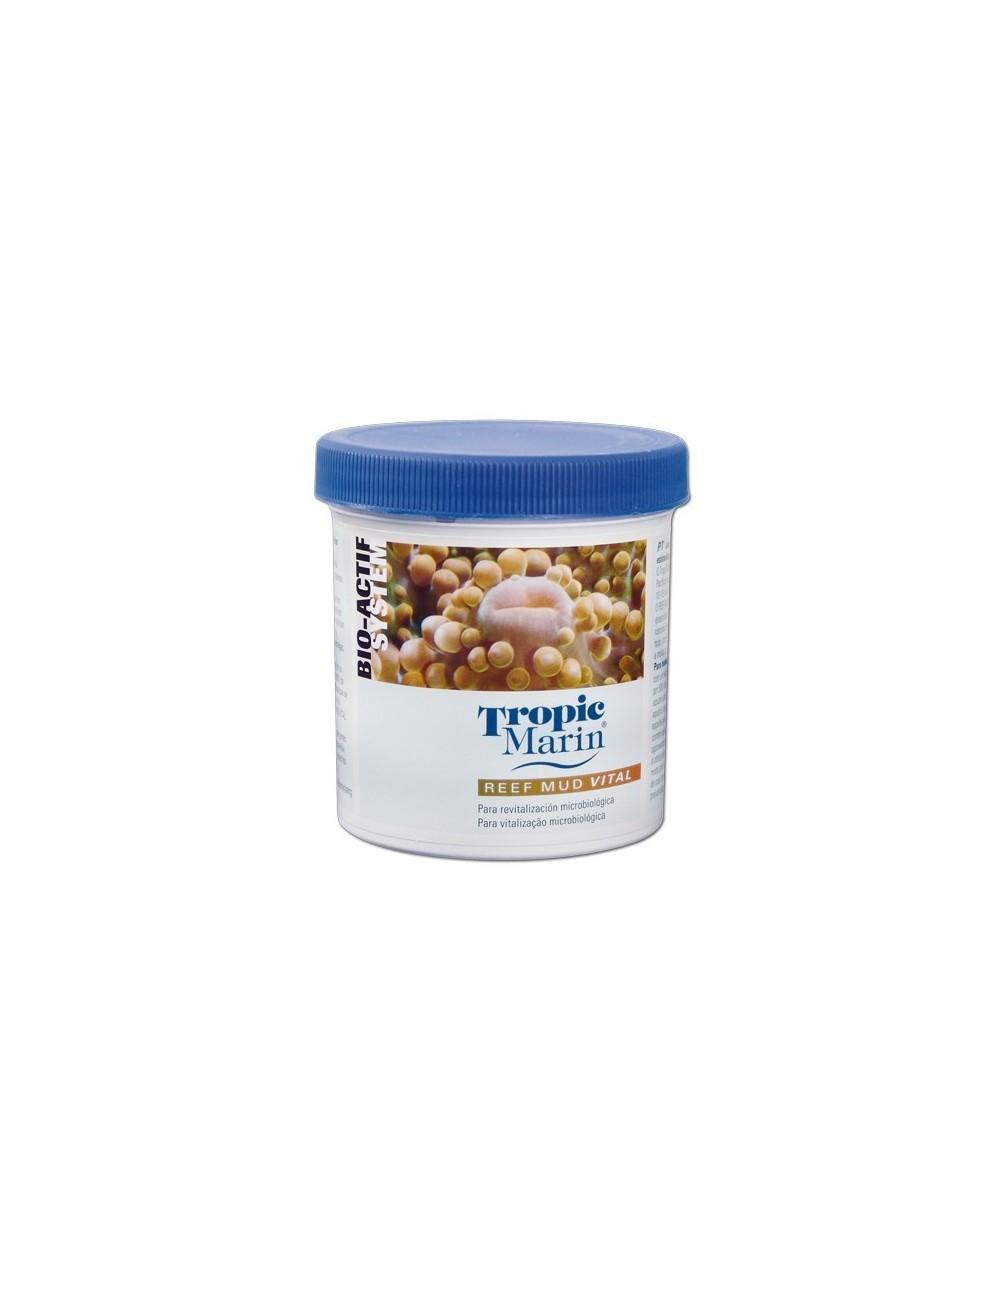 TROPIC MARIN - REEF MUD Vital 680 g